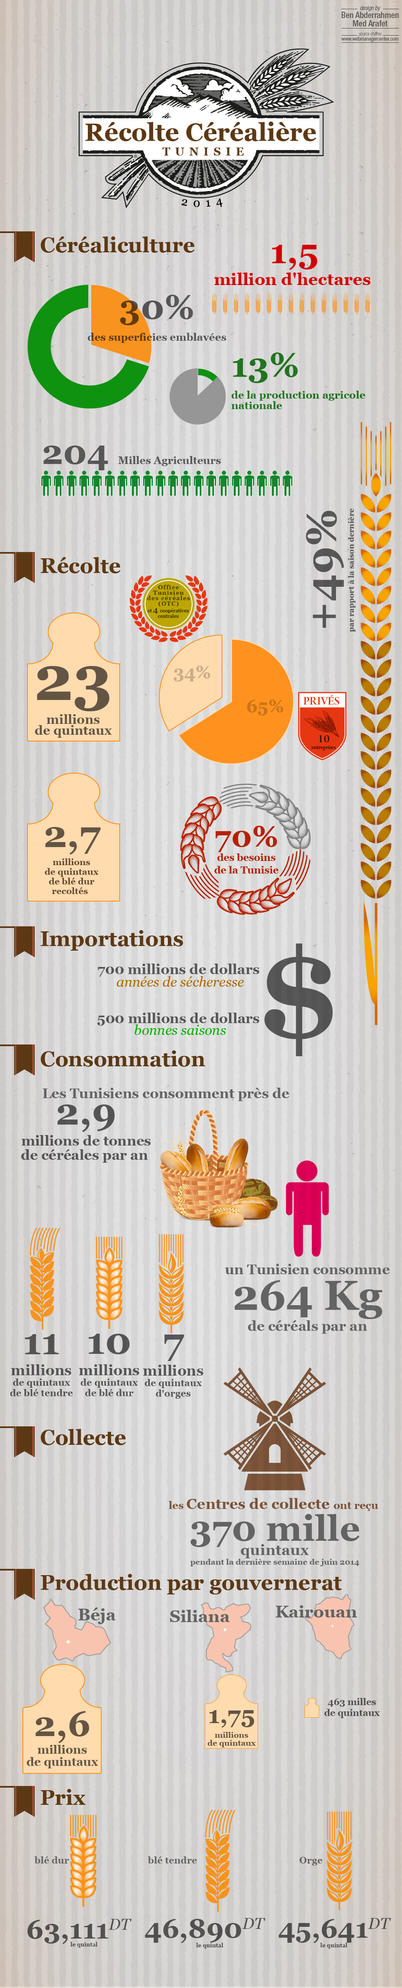 Infographie Recolte Cerealiere Tunisie 2014 by marafet